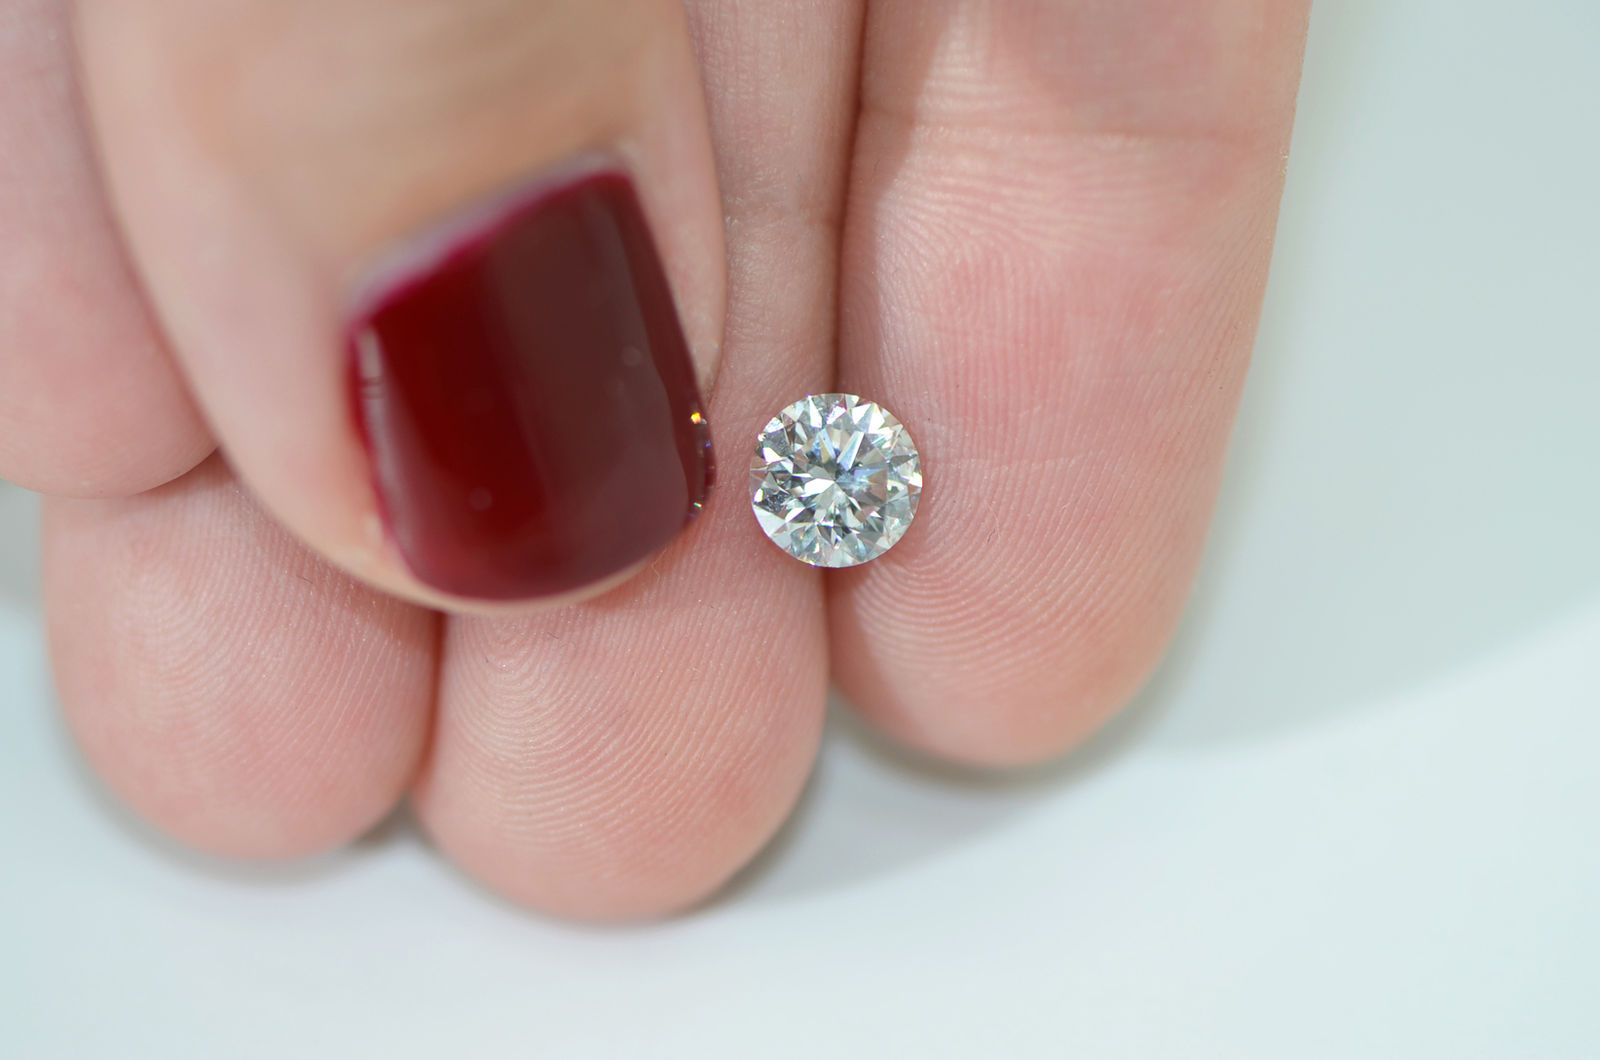 1 Carat Round Shaped G VS2 Eye Clean Natural Diamond Enhanced For ...